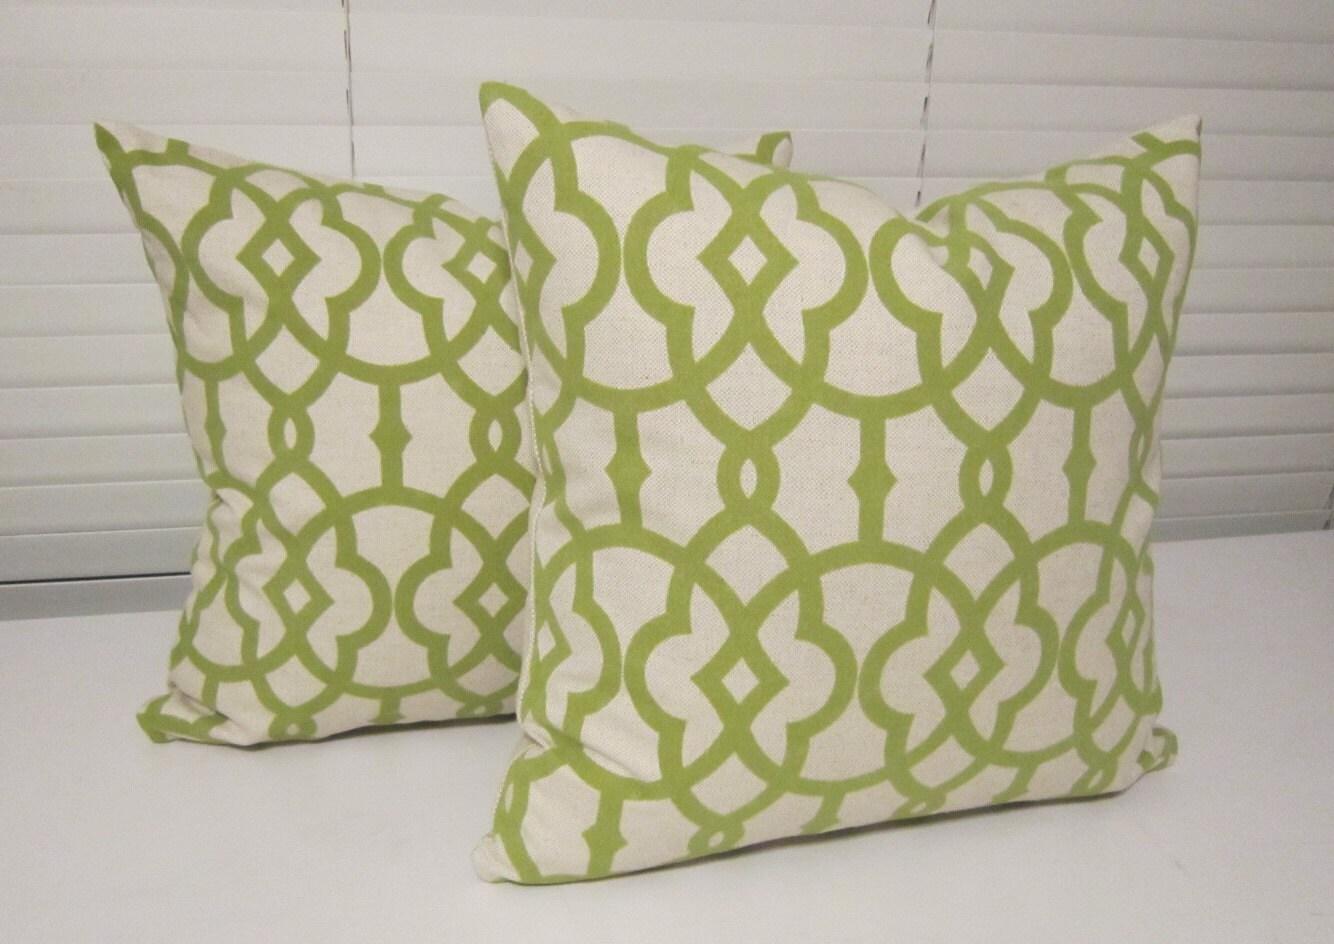 Green Geometric Throw Pillow : Flocked Green Geometric Decorative Pillow by PillowLoftHomeDecor